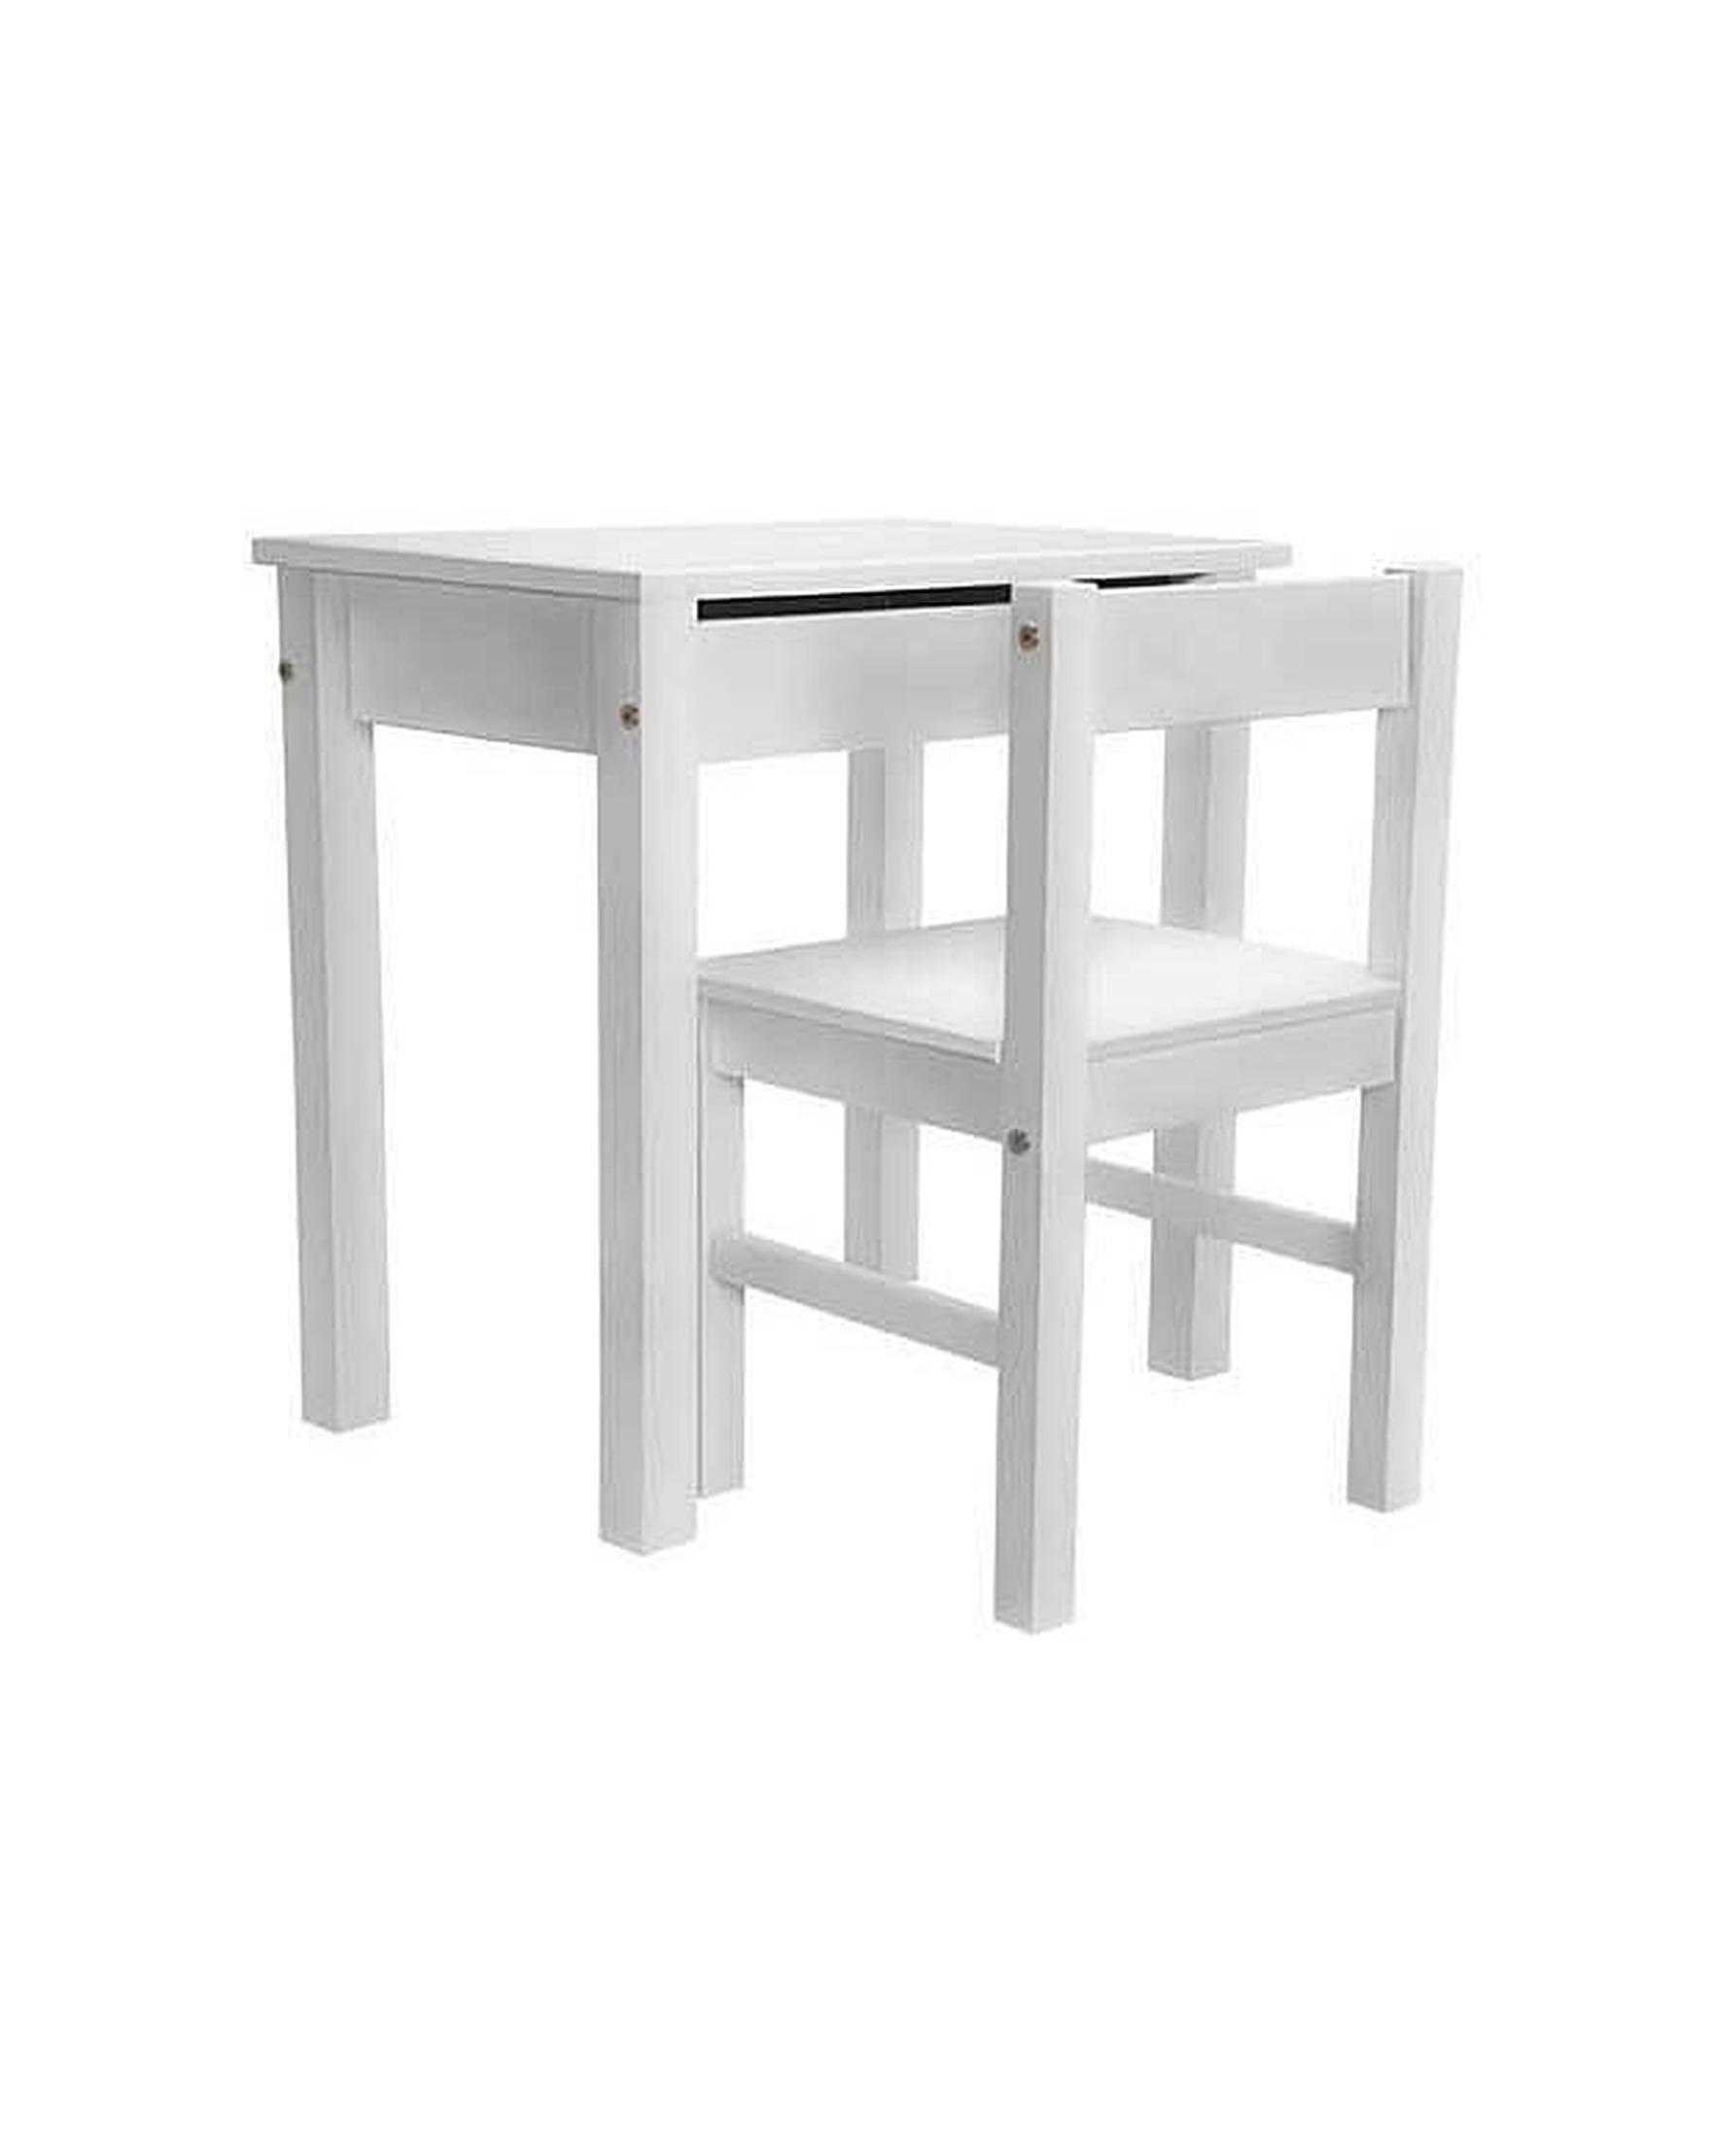 chair gym argos craigslist recliner chairs union jack towel image jardimage co